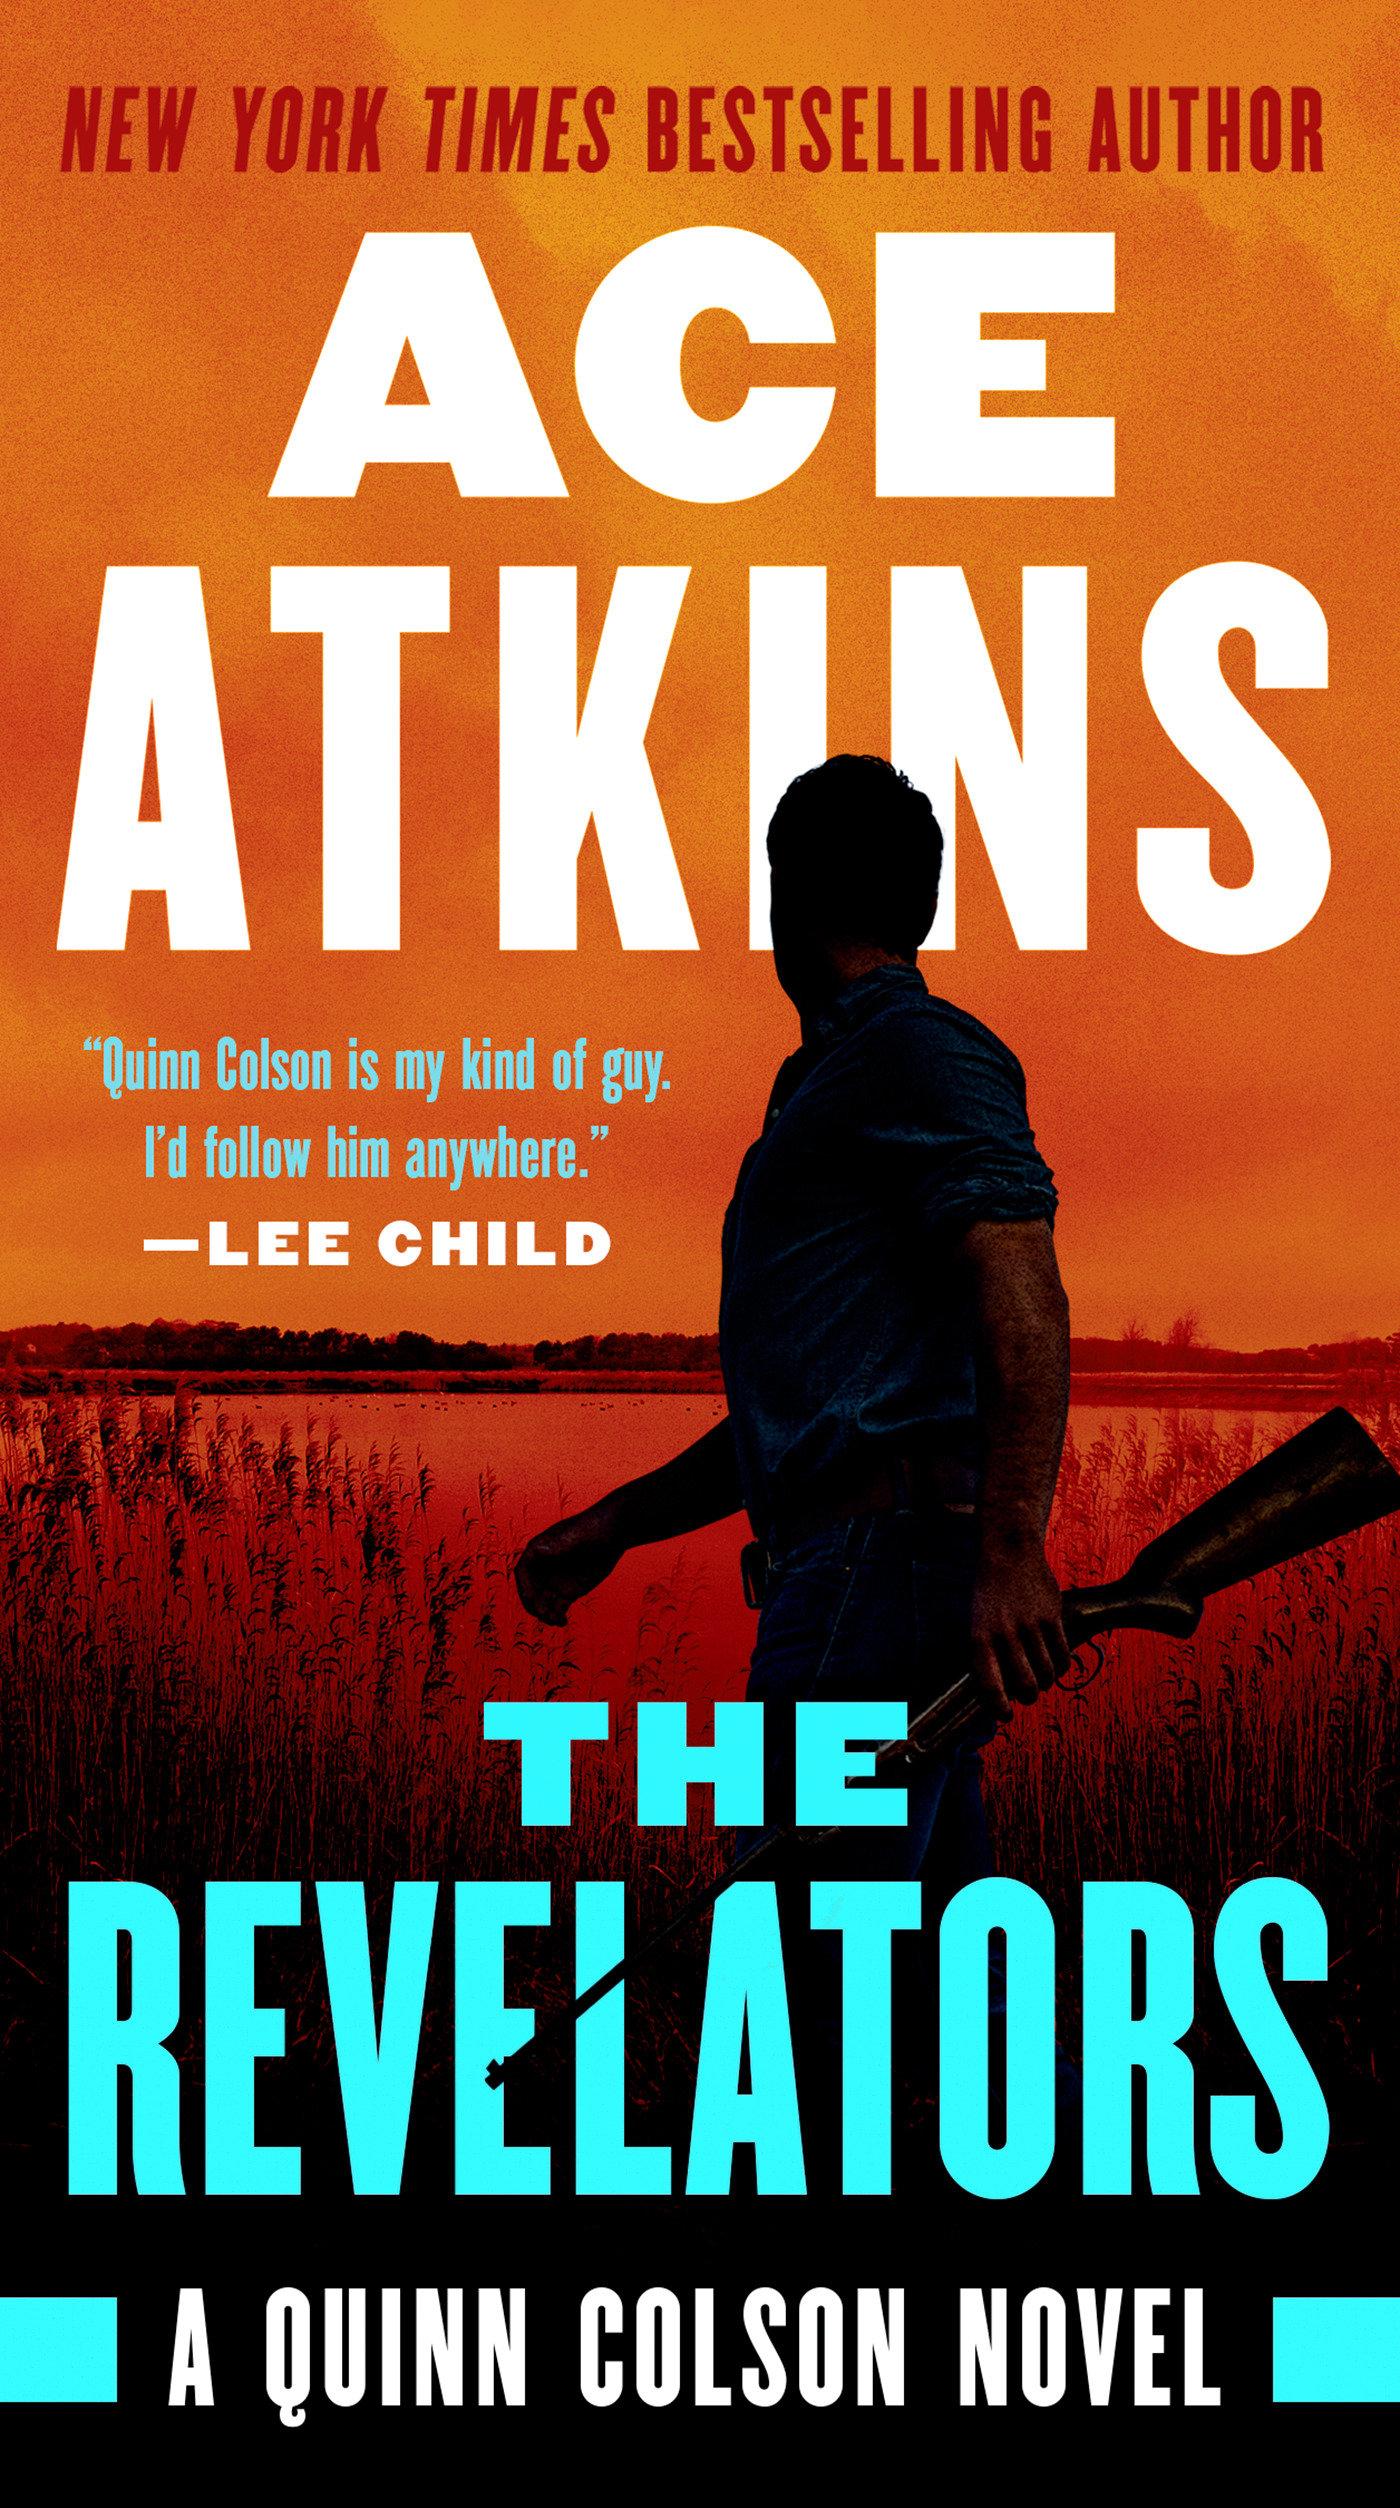 The Revelators cover image